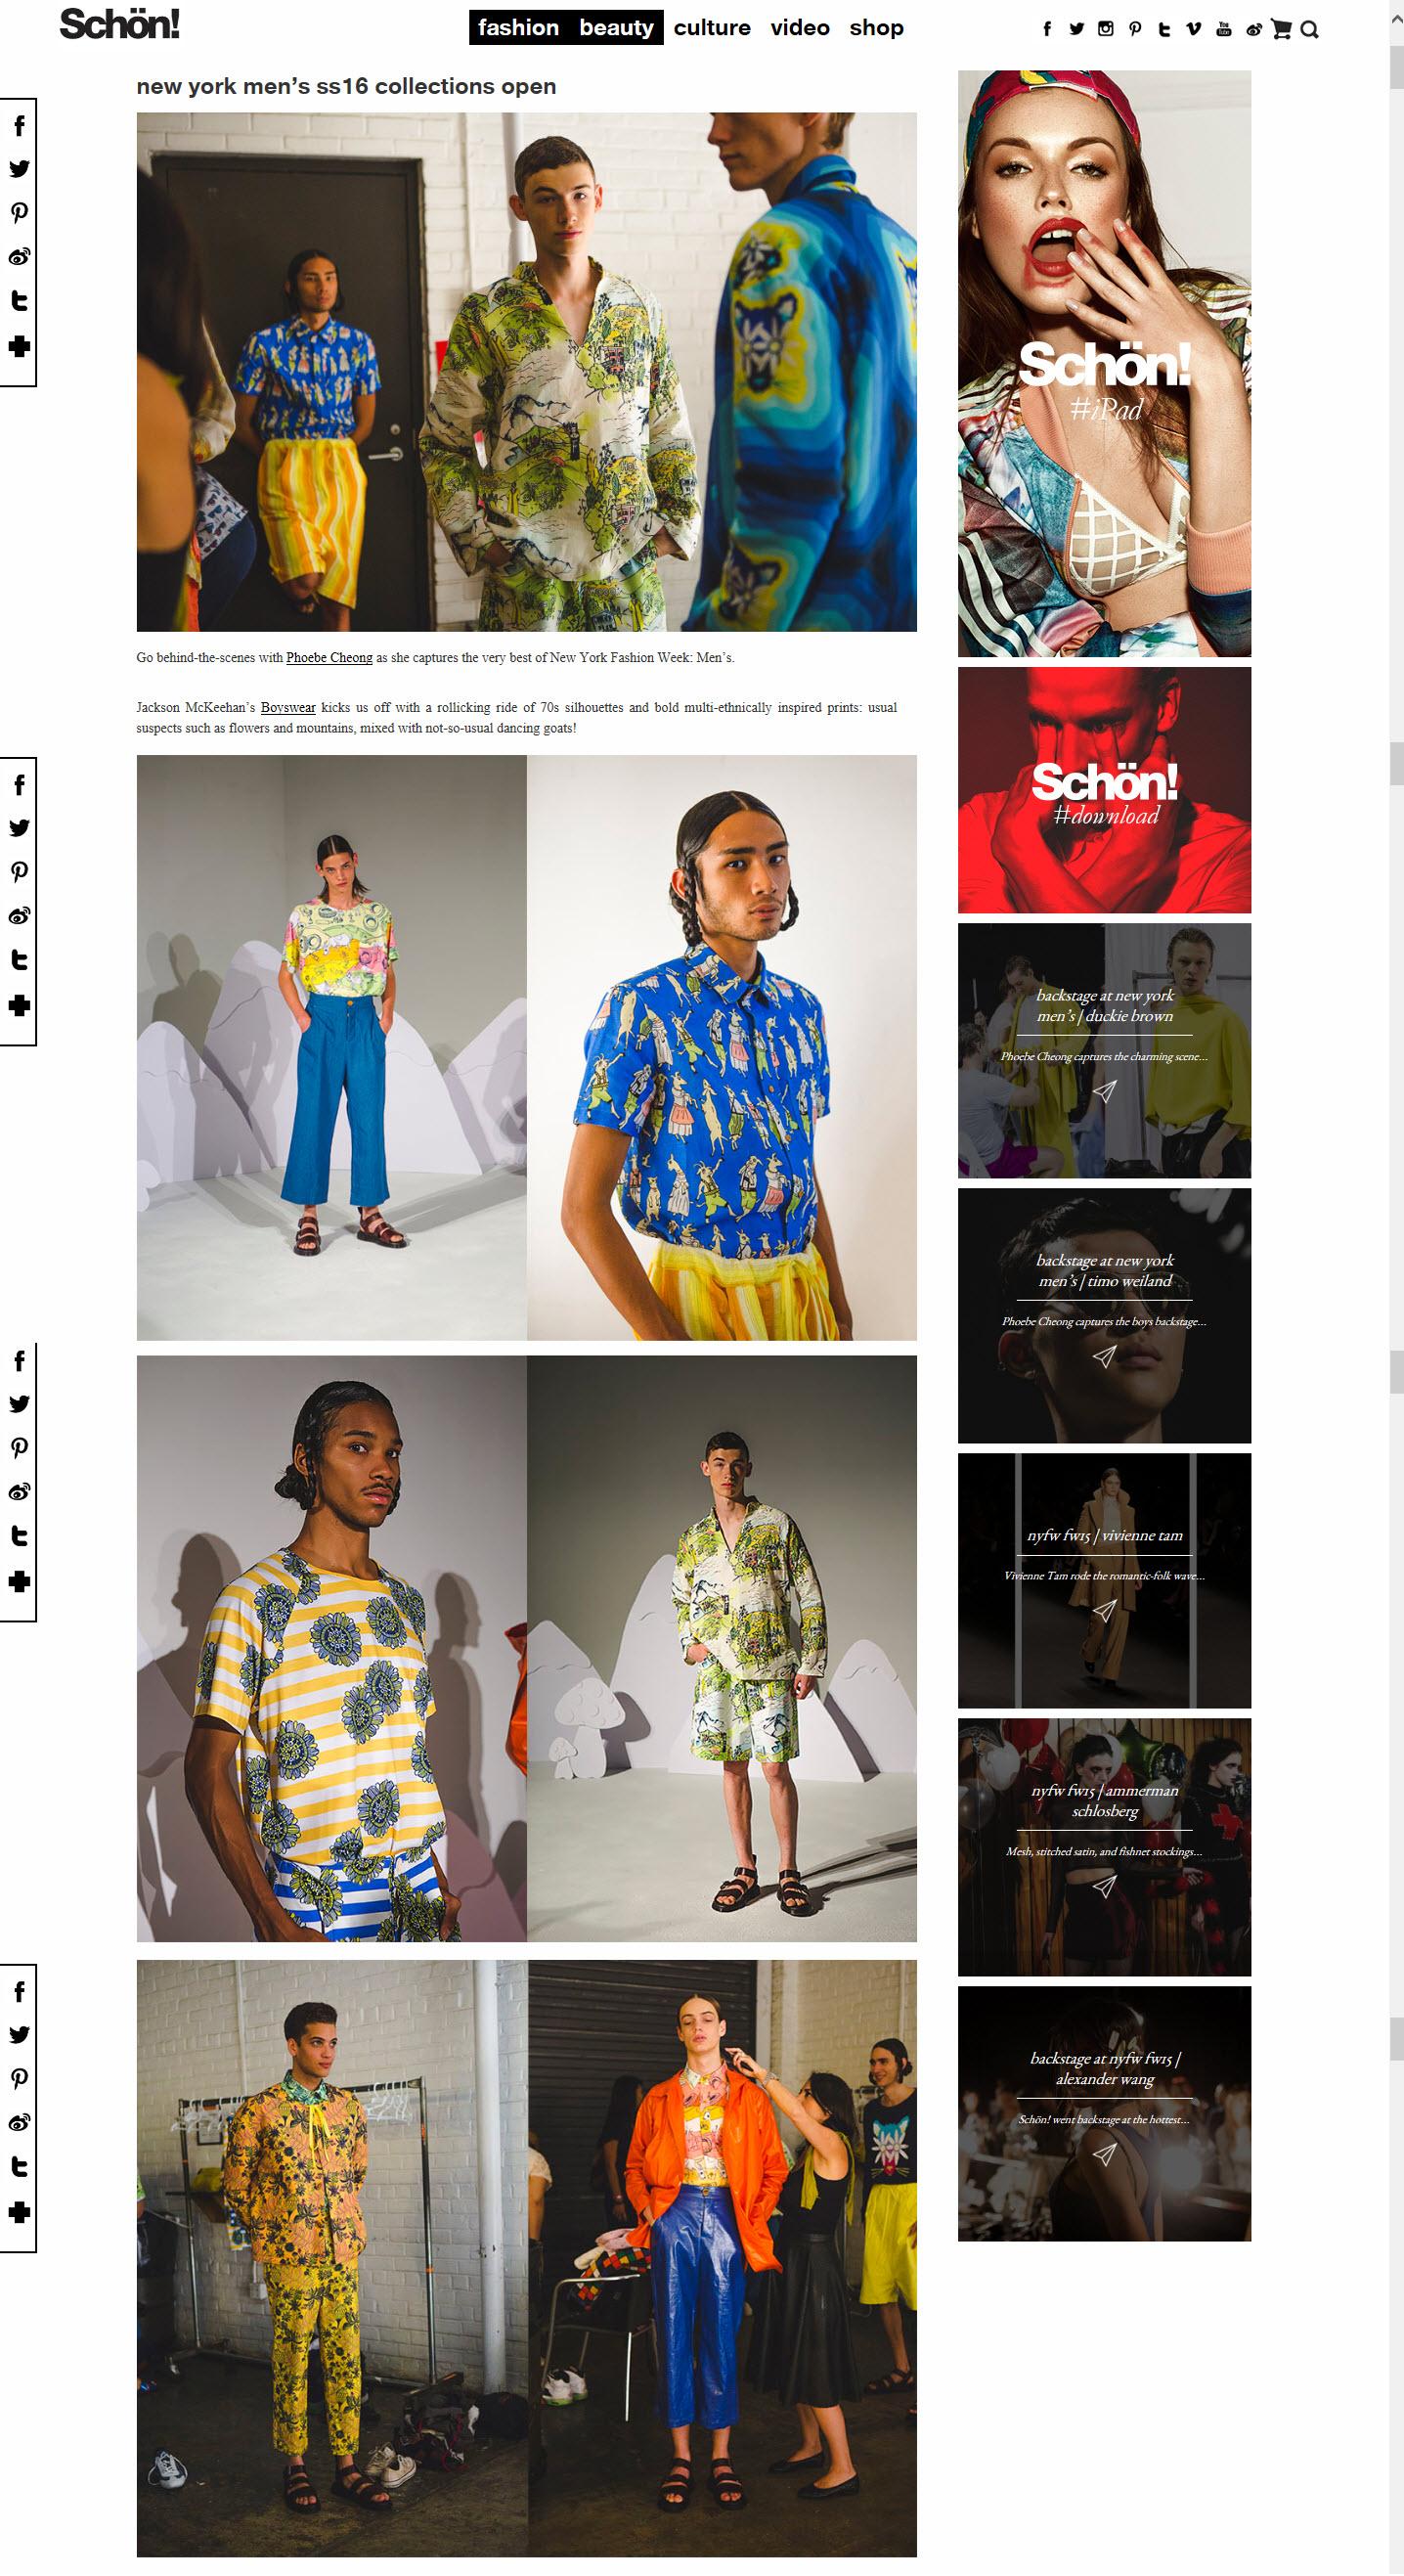 SchonMagazine.com 7.17.15.jpg